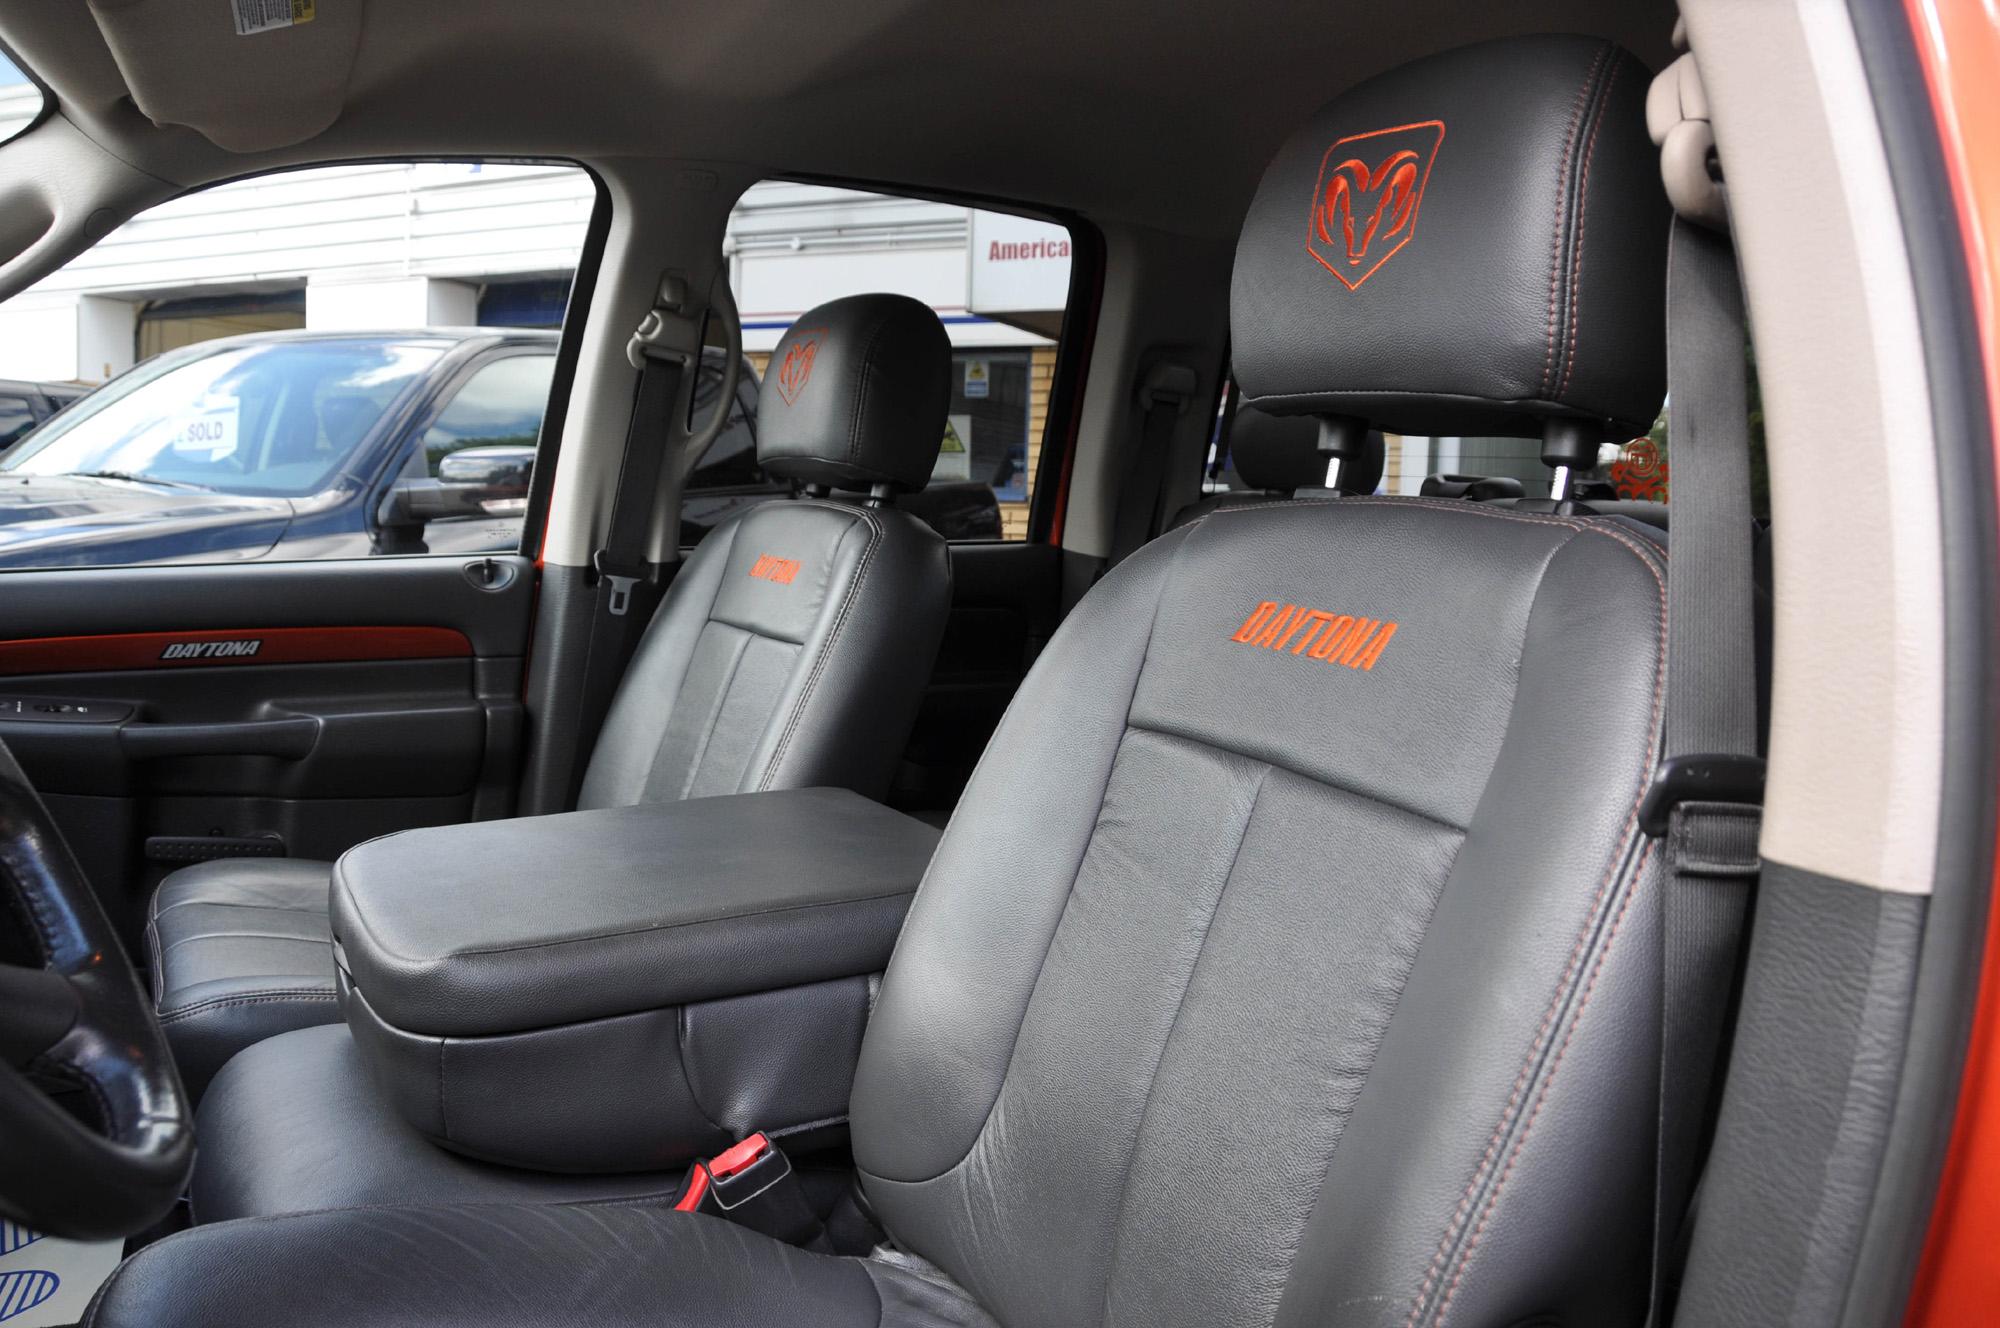 2005 55 dodge ram 1500 daytona quad cab all wheel drive - 2005 dodge ram 1500 interior parts ...